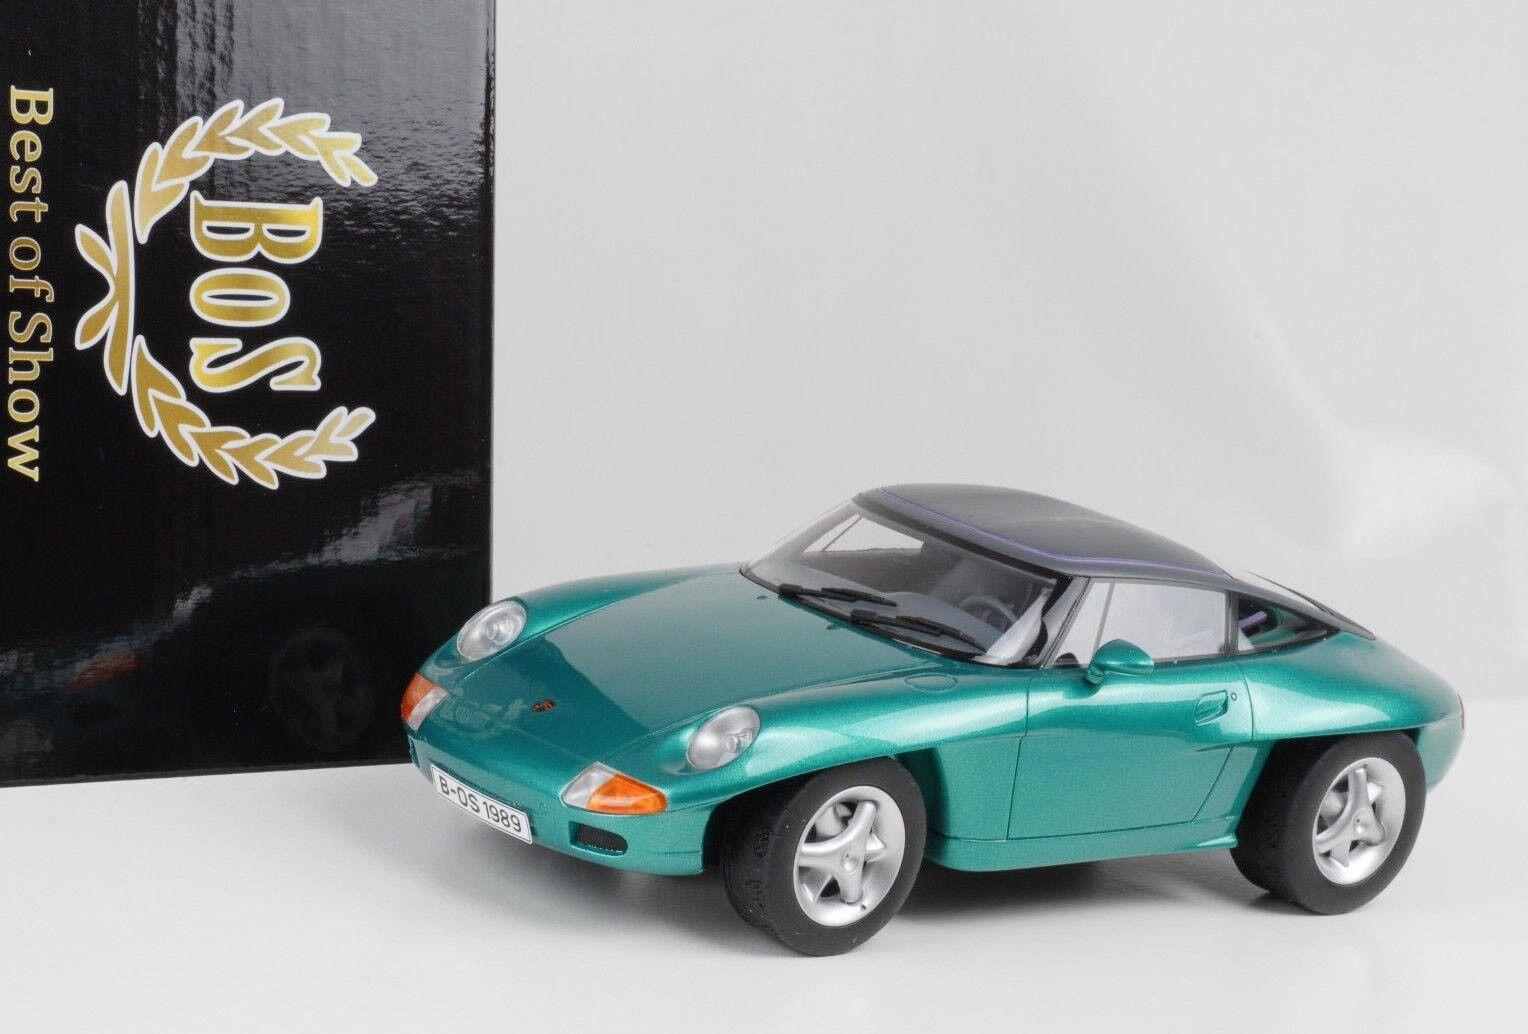 1989 Porsche 911 Pan Americana Concept Coche Iaa Frankfurt 1 18 Bos Resina Nuevo